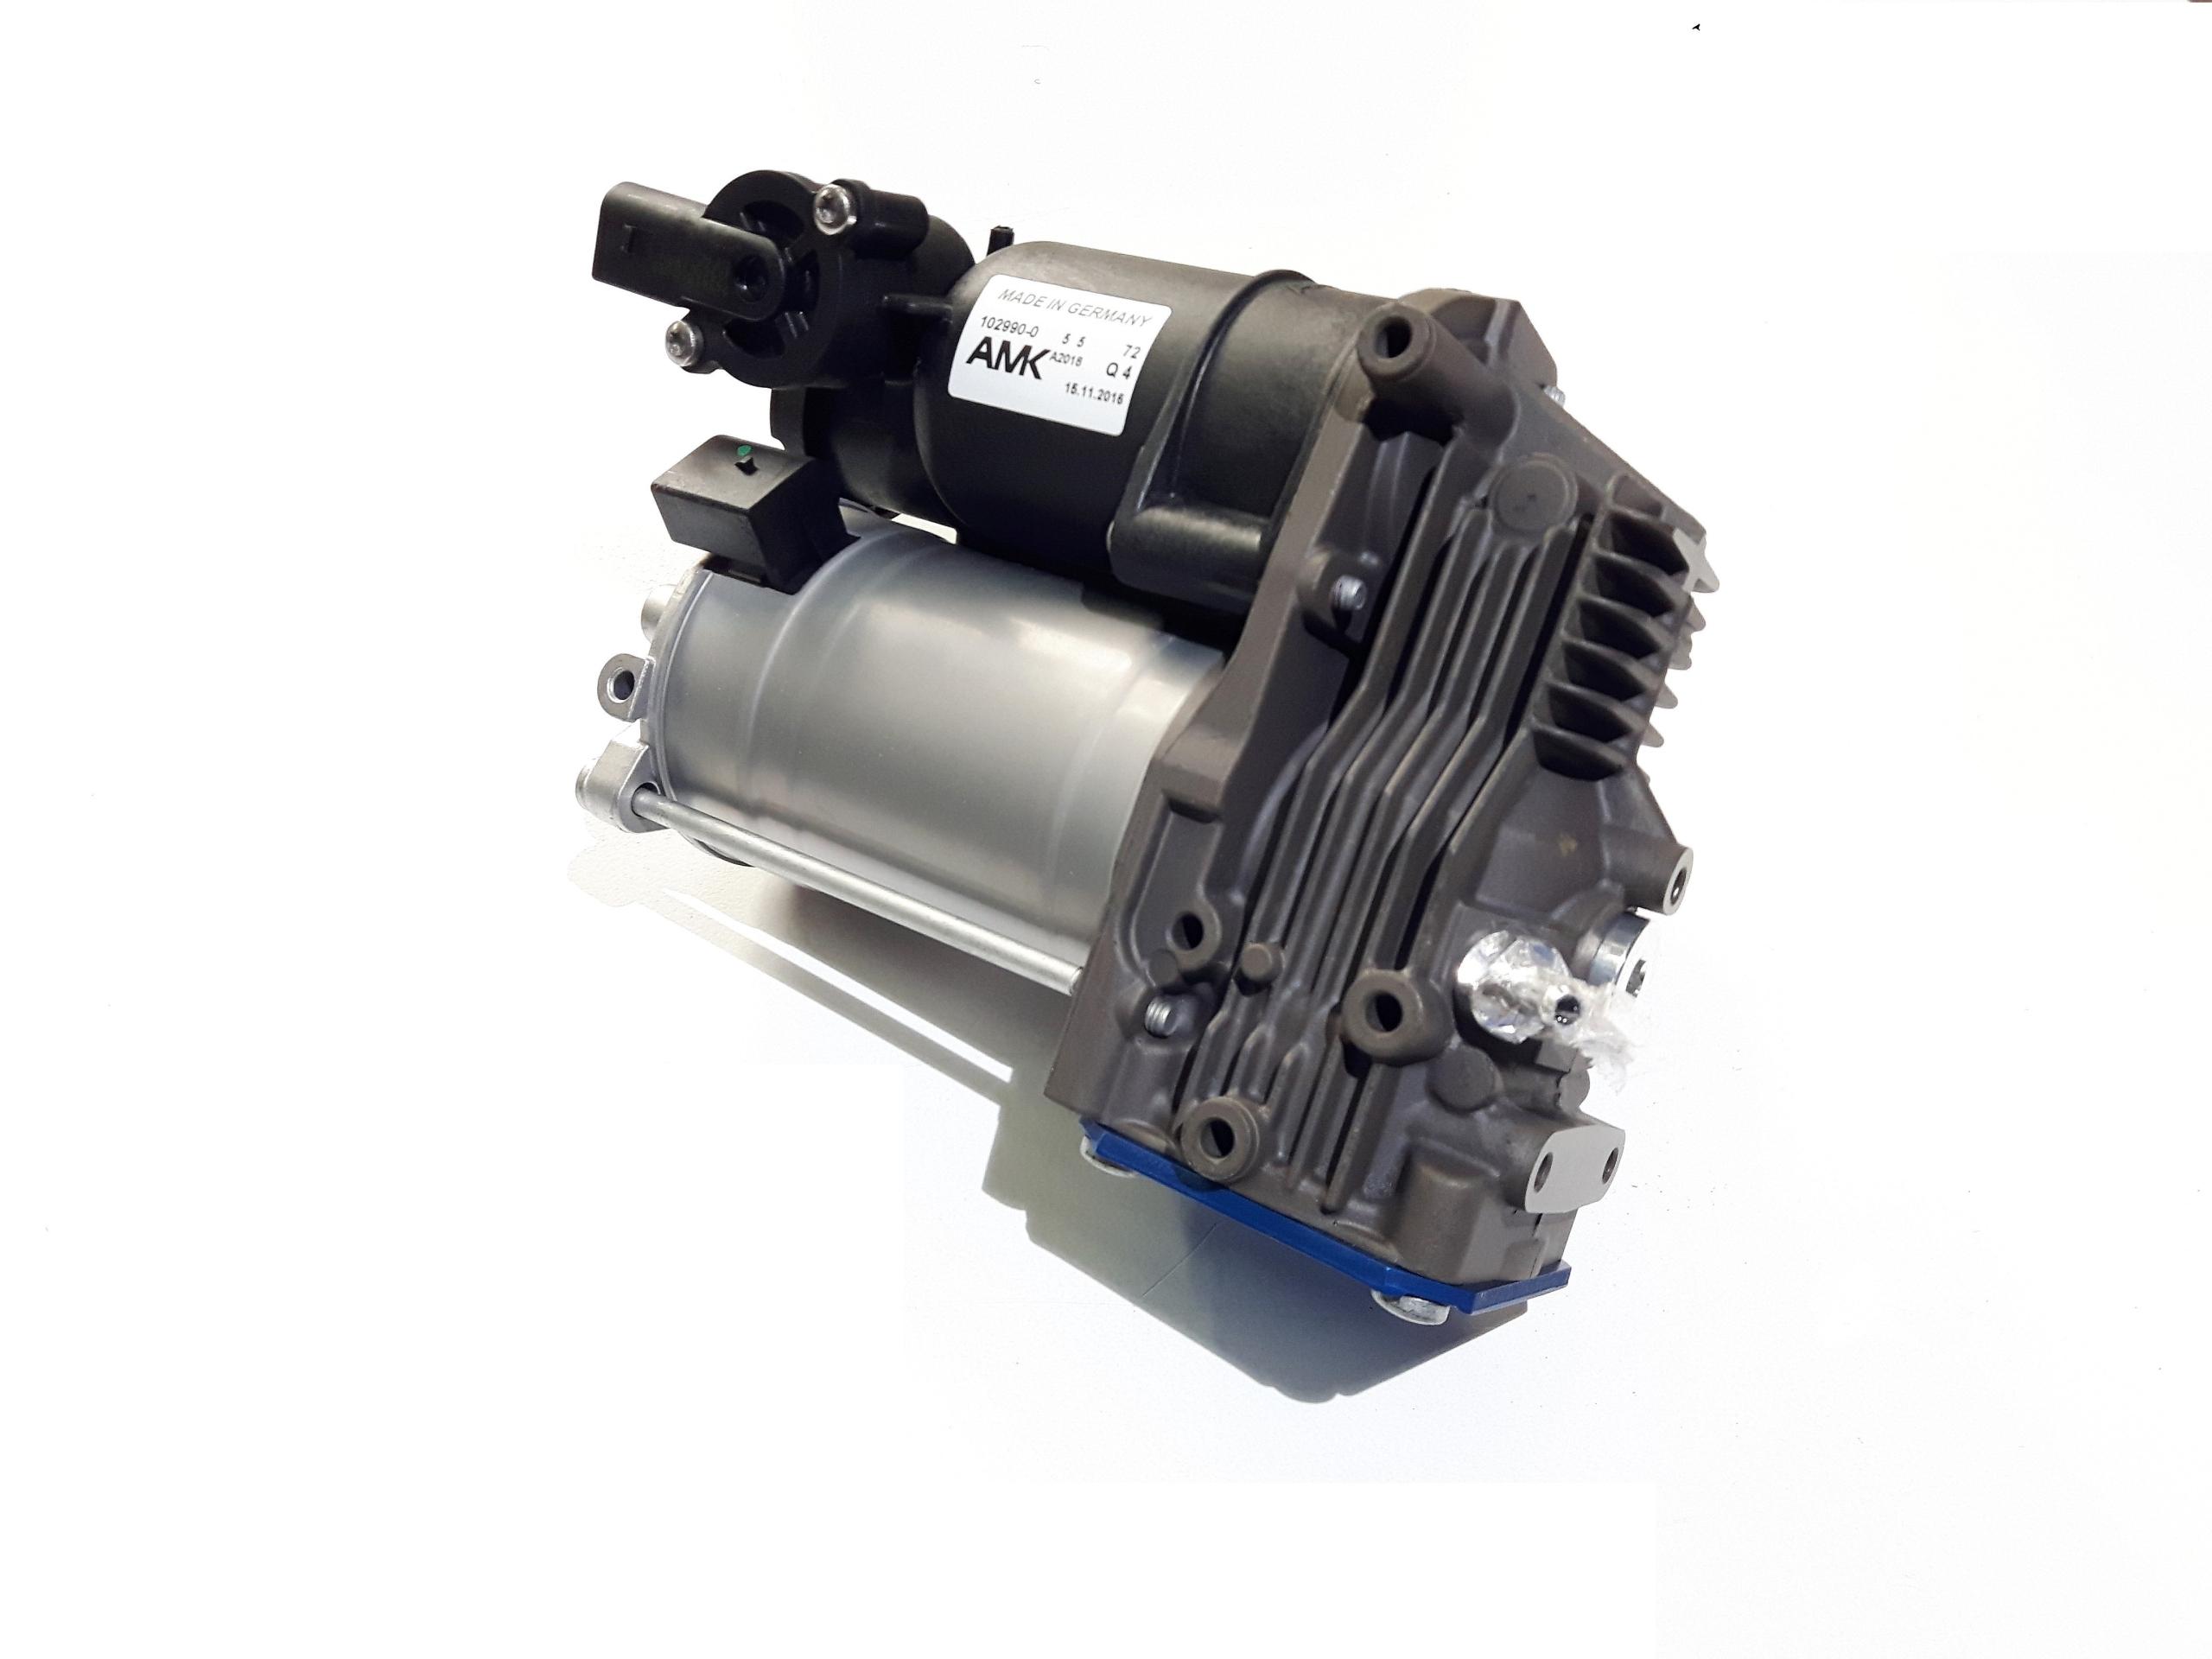 mercedes s-klasa w221 насос компрессор подвески